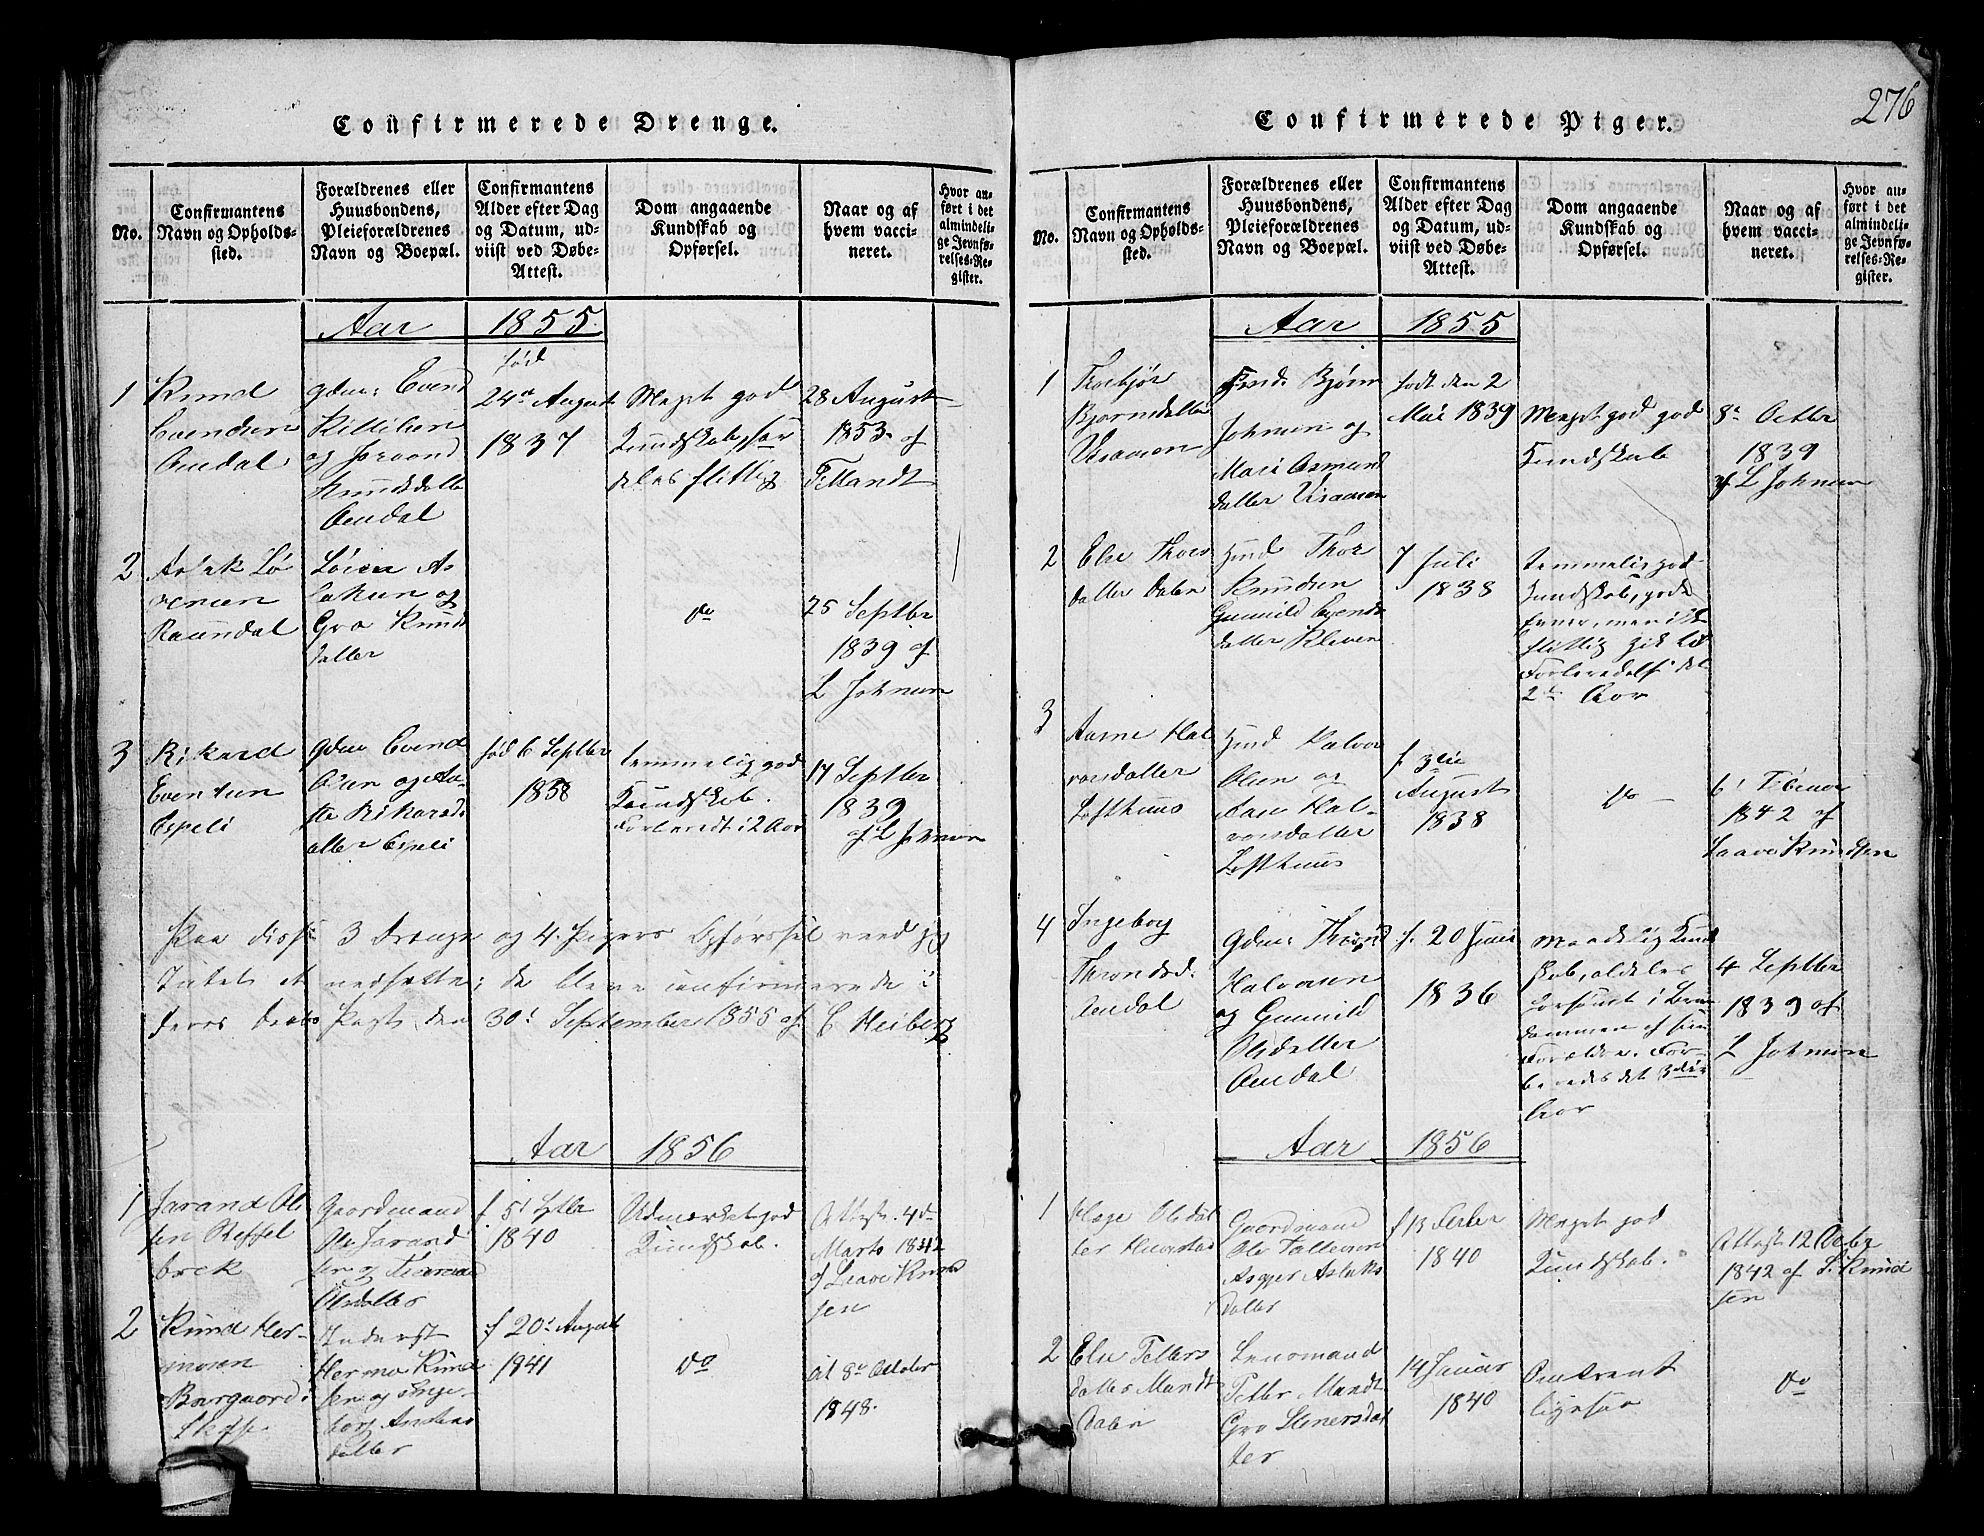 SAKO, Lårdal kirkebøker, G/Gb/L0001: Klokkerbok nr. II 1, 1815-1865, s. 276